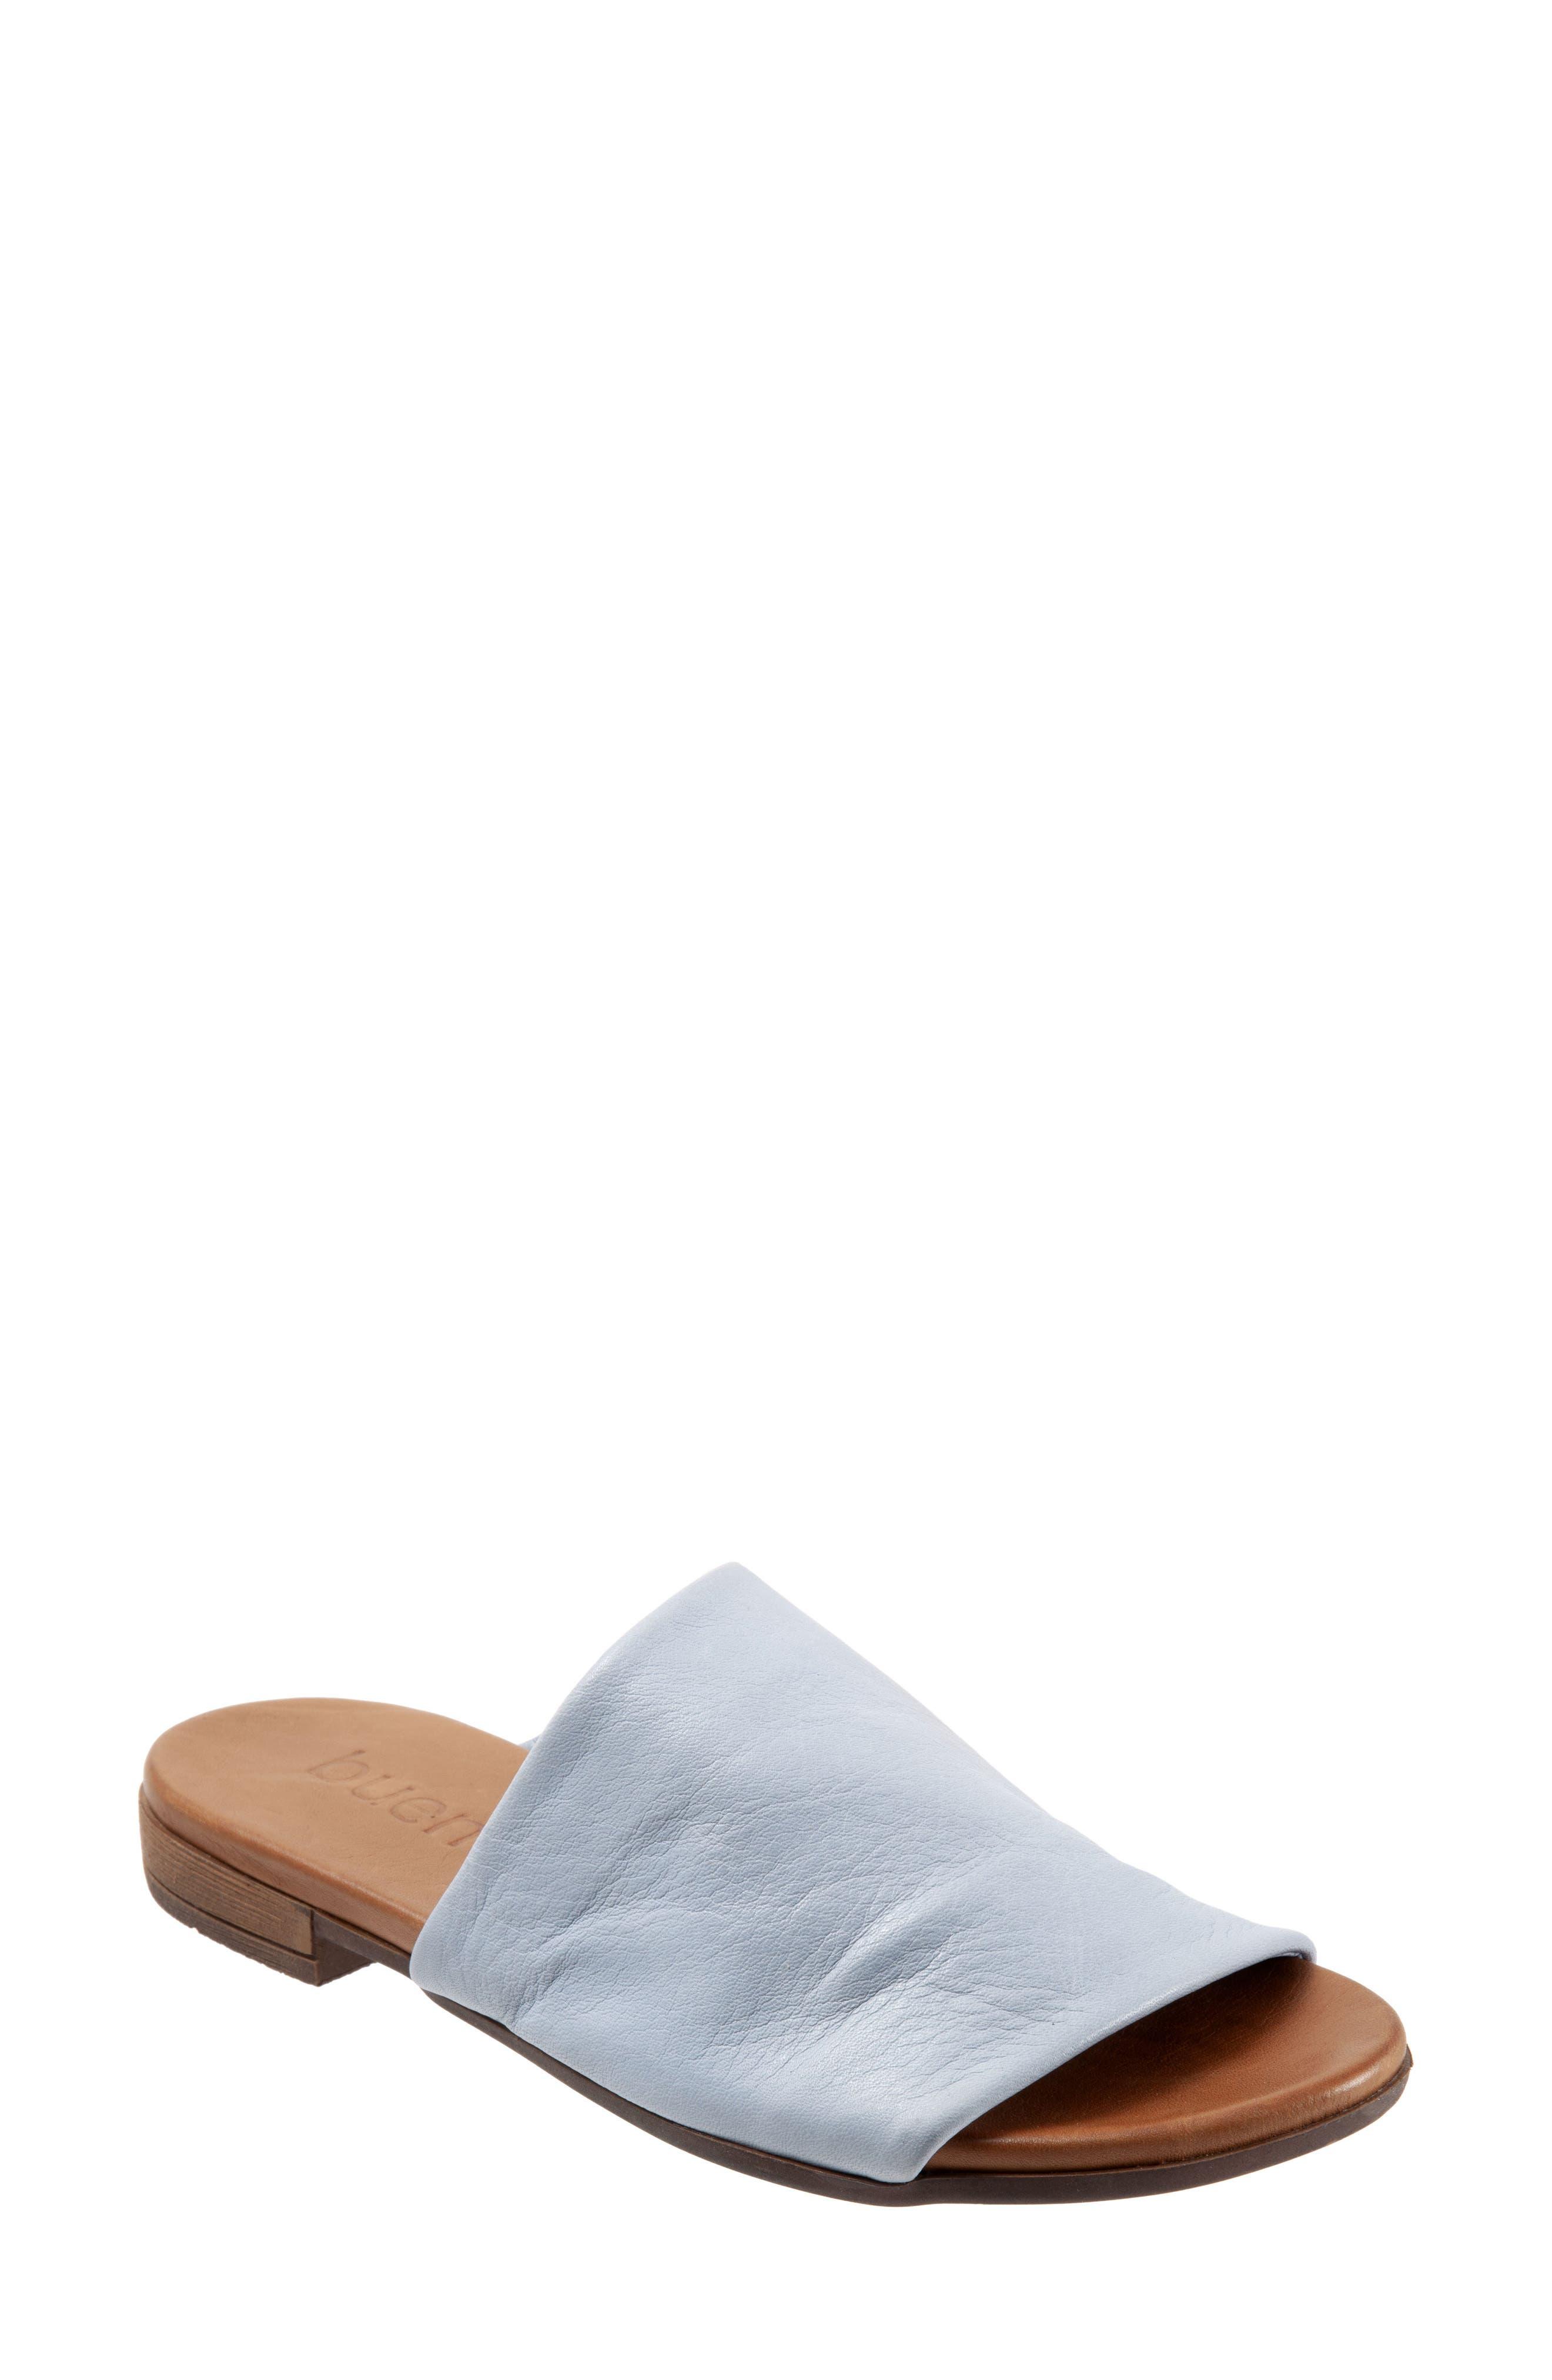 Turner Slide Sandal